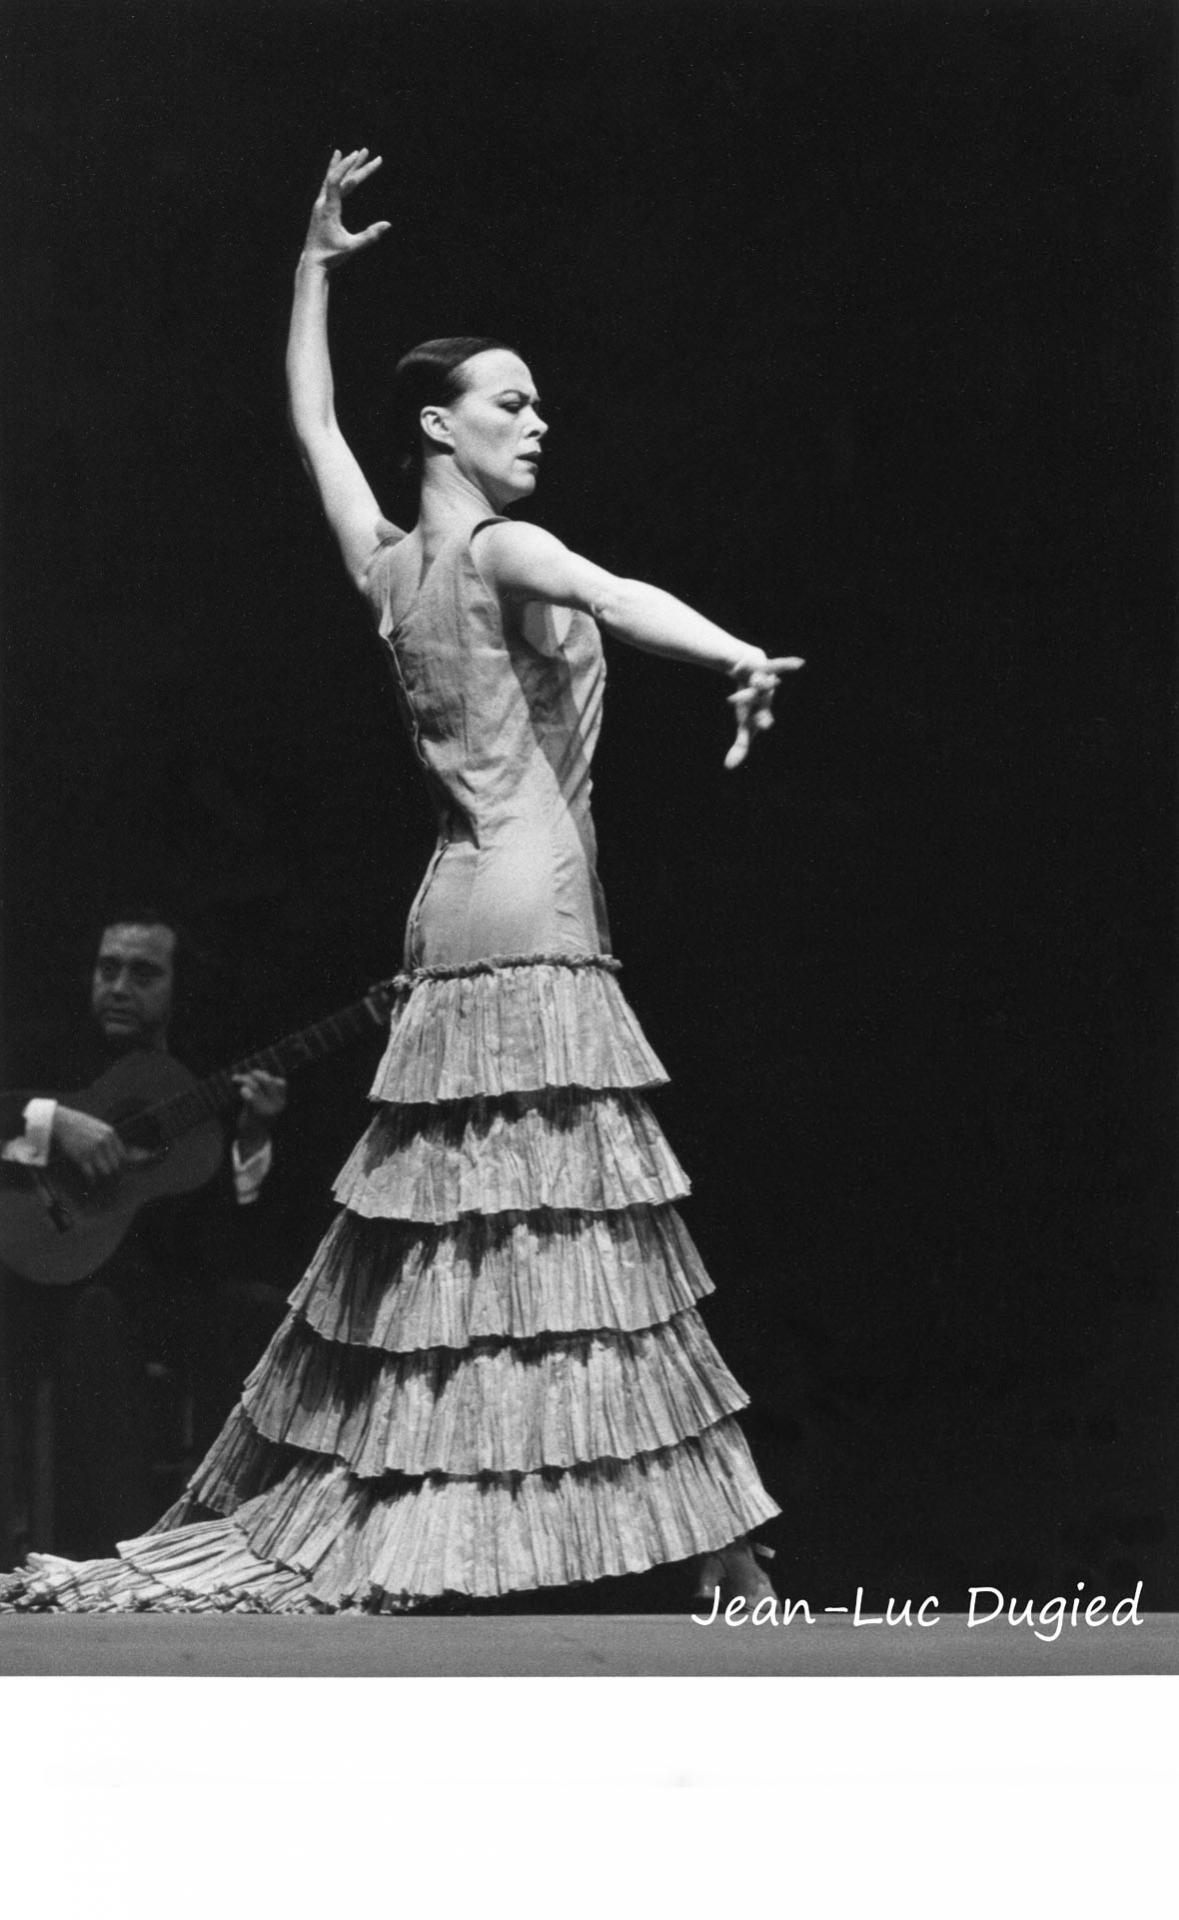 6 Flamenco puro de Claudio Segovia et Hector Orezzoli - Manuela Vargas - 1984